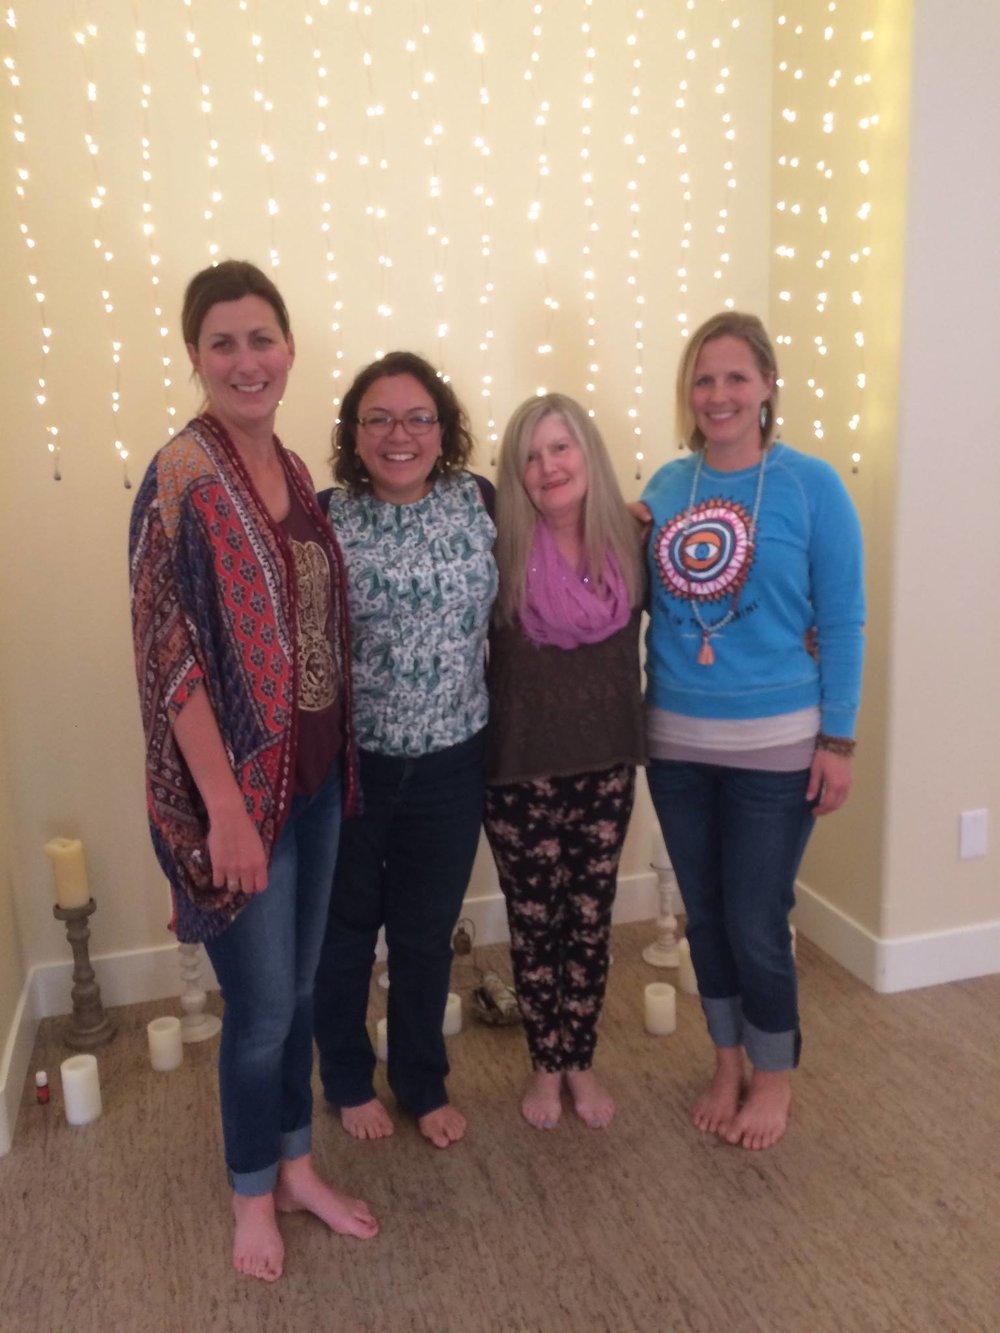 Abril 2016, Certificada por Yoga Alliance, San Luis Obispo, CA, USA